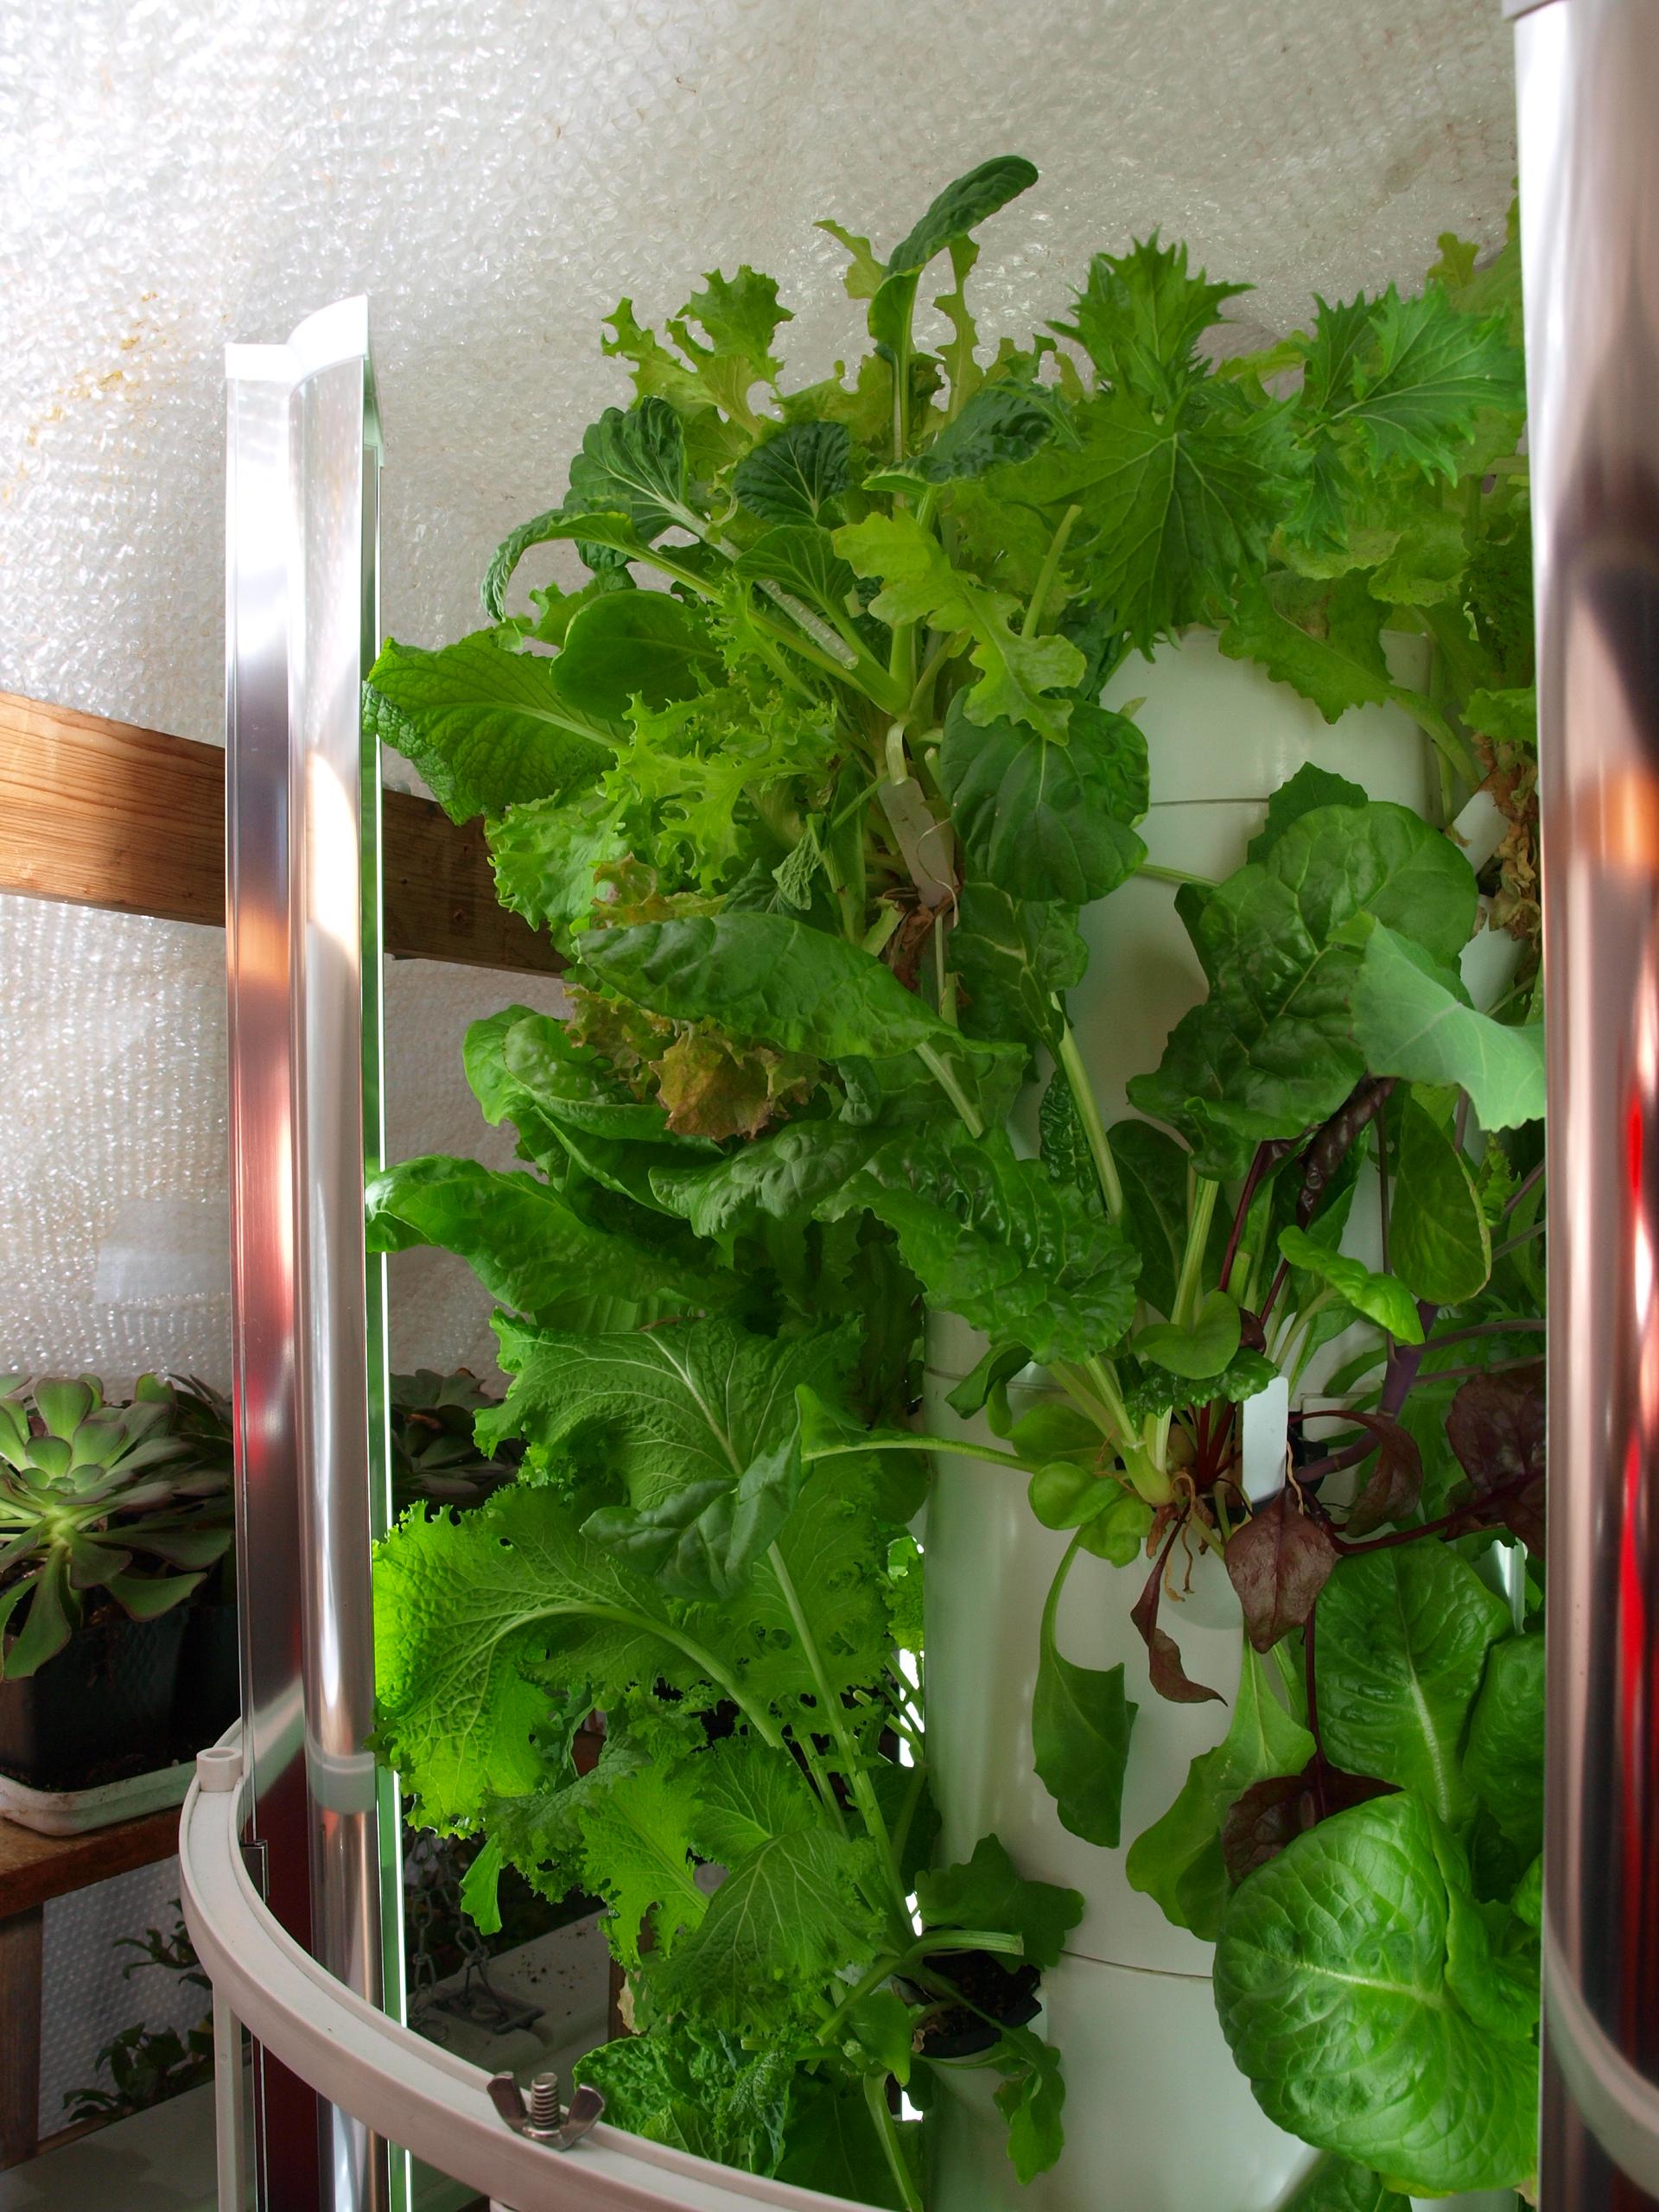 Tower Garden is a Lettuce Growing Machine